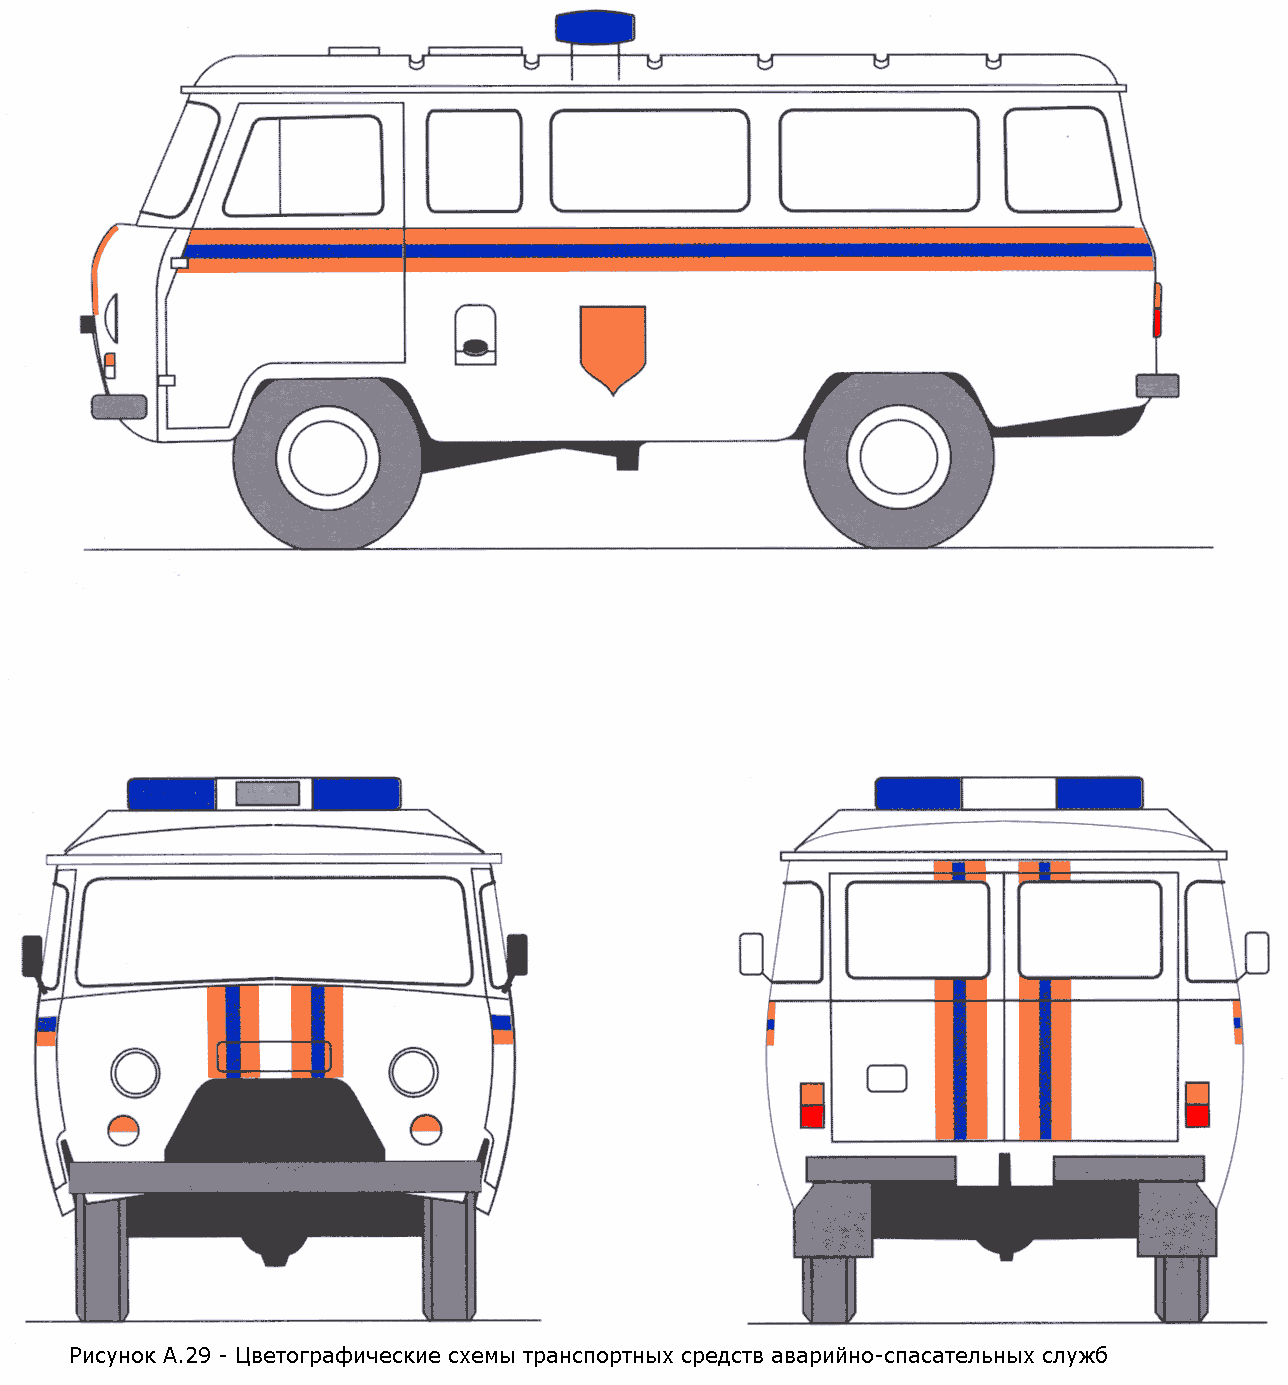 РИСУНОК А.29 (К ГОСТ Р 50574-2002)